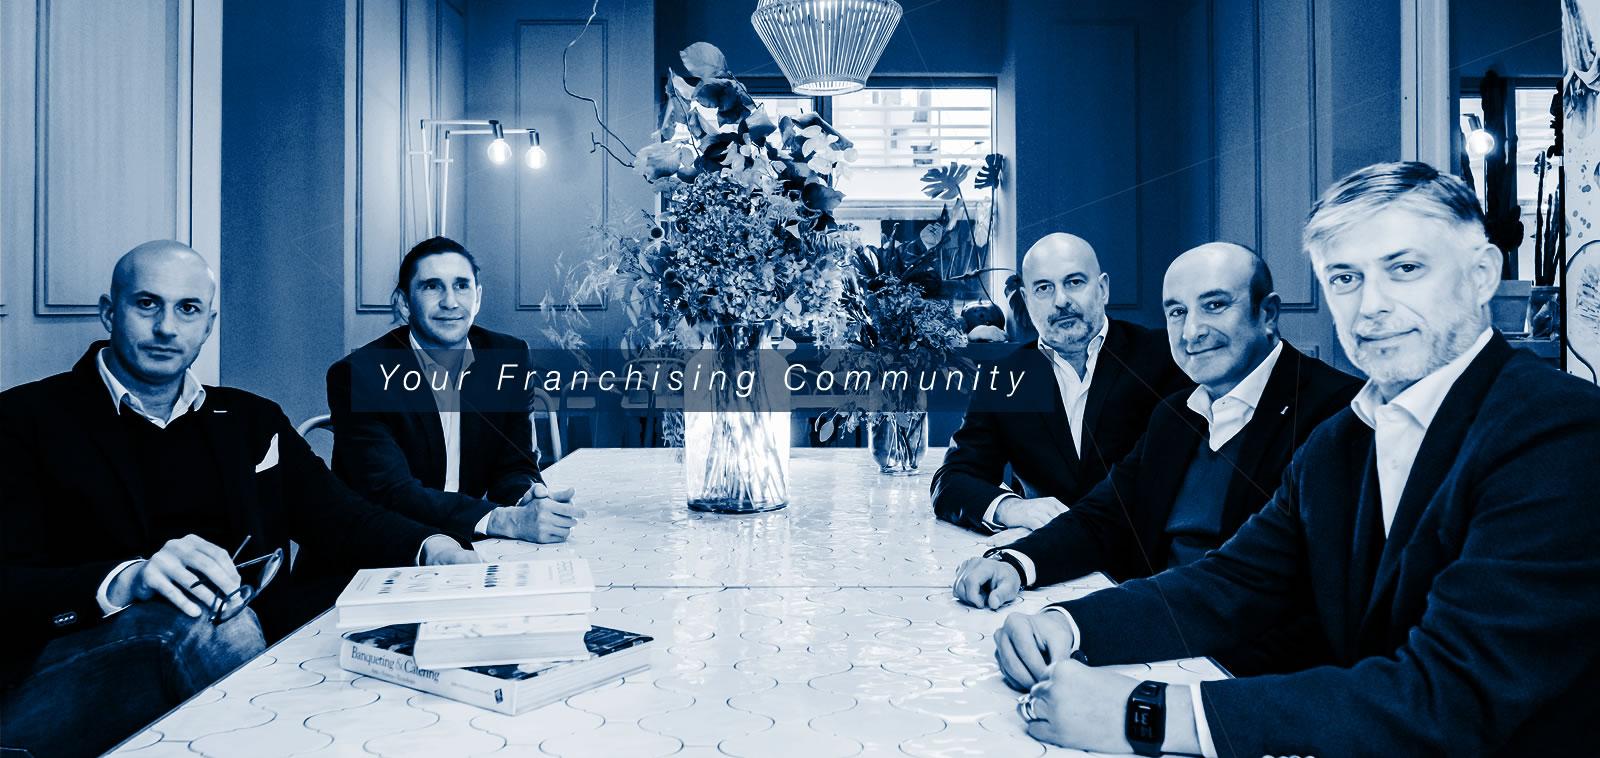 Nasce Affilya, Prima Business Community Del Franchising In Italia.